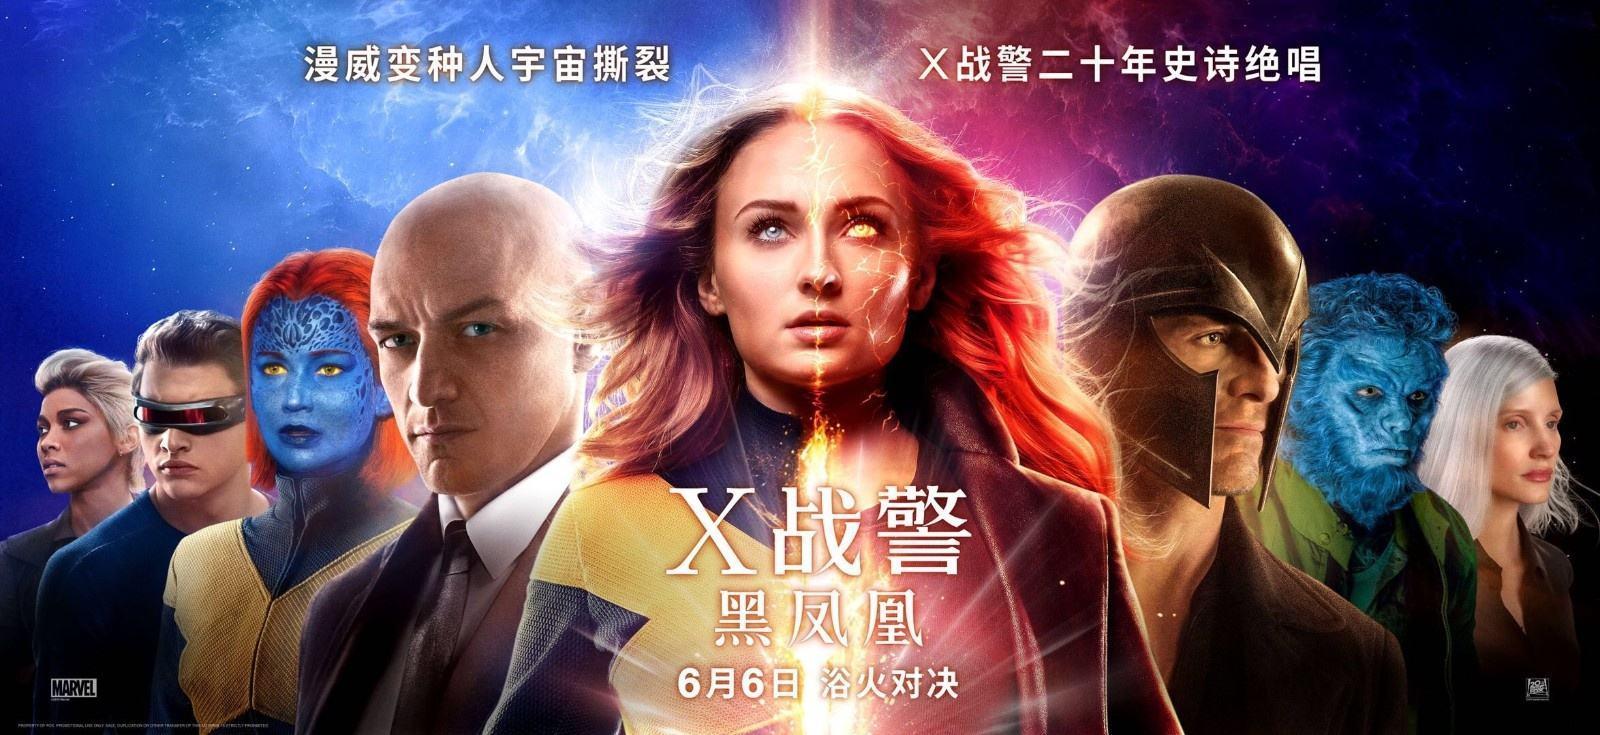 X战警:黑凤凰